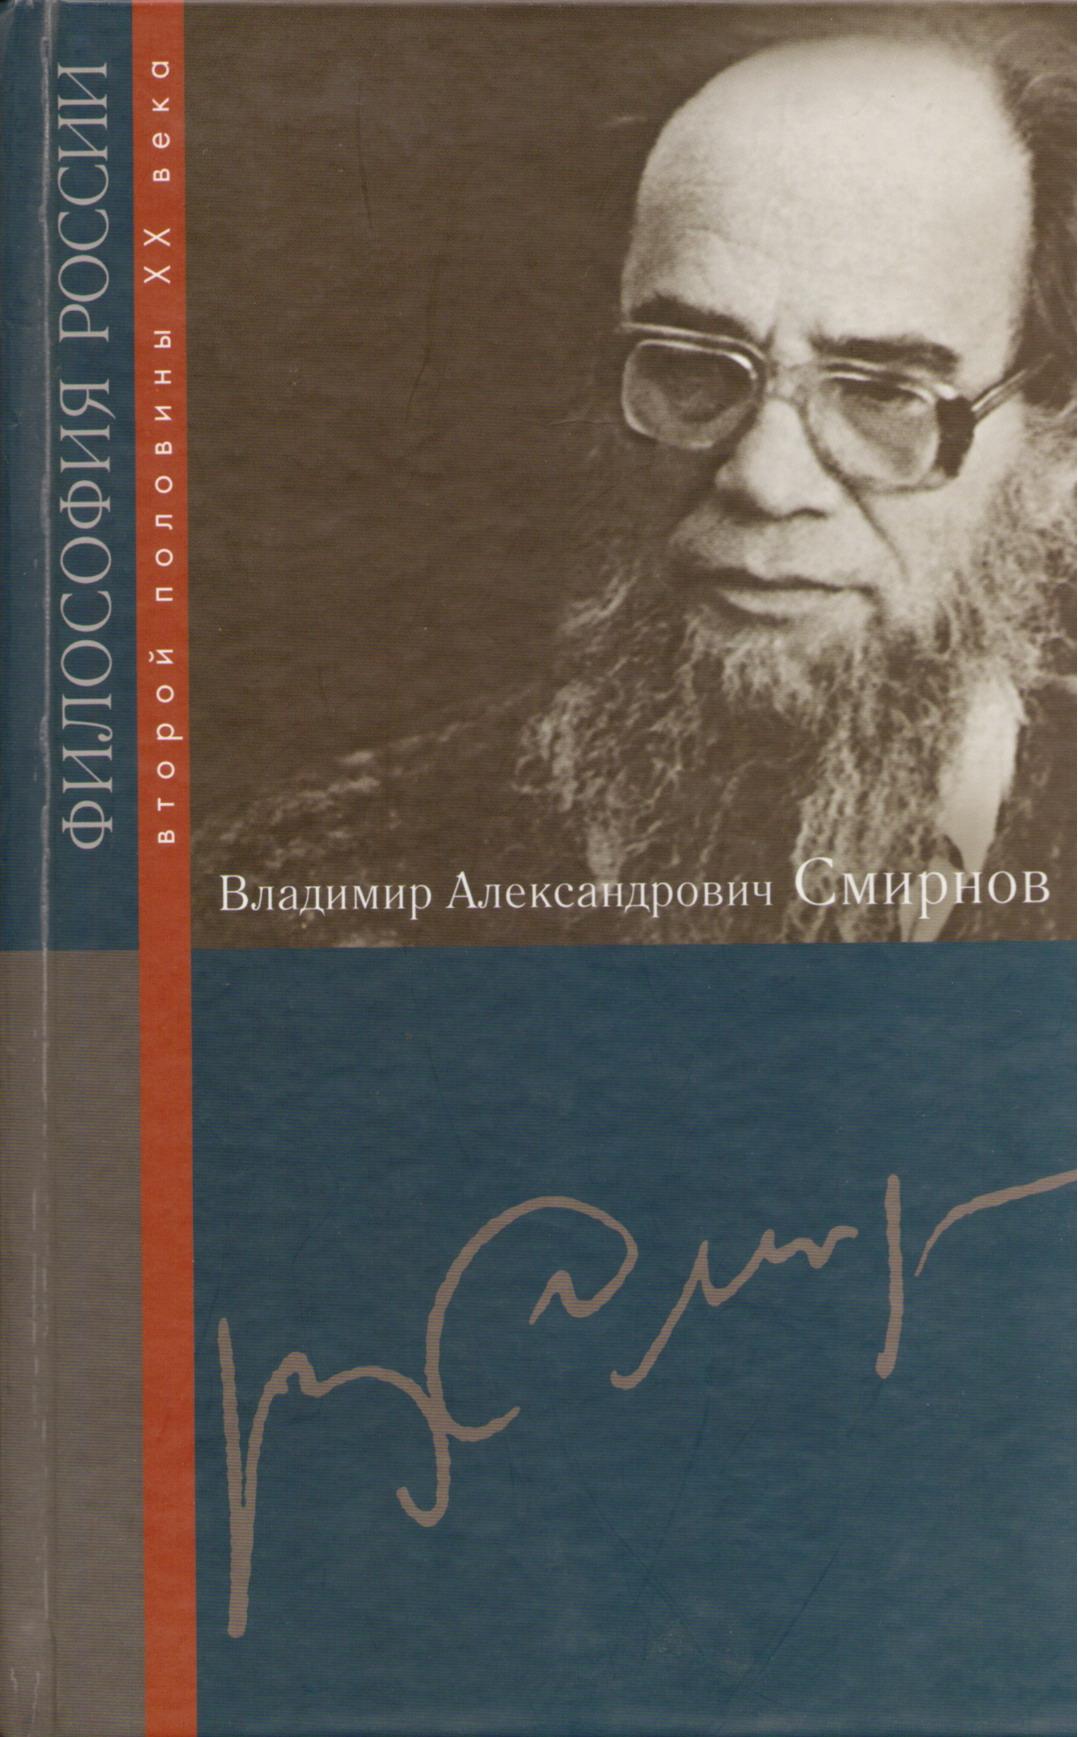 Владимир Александрович Смирнов